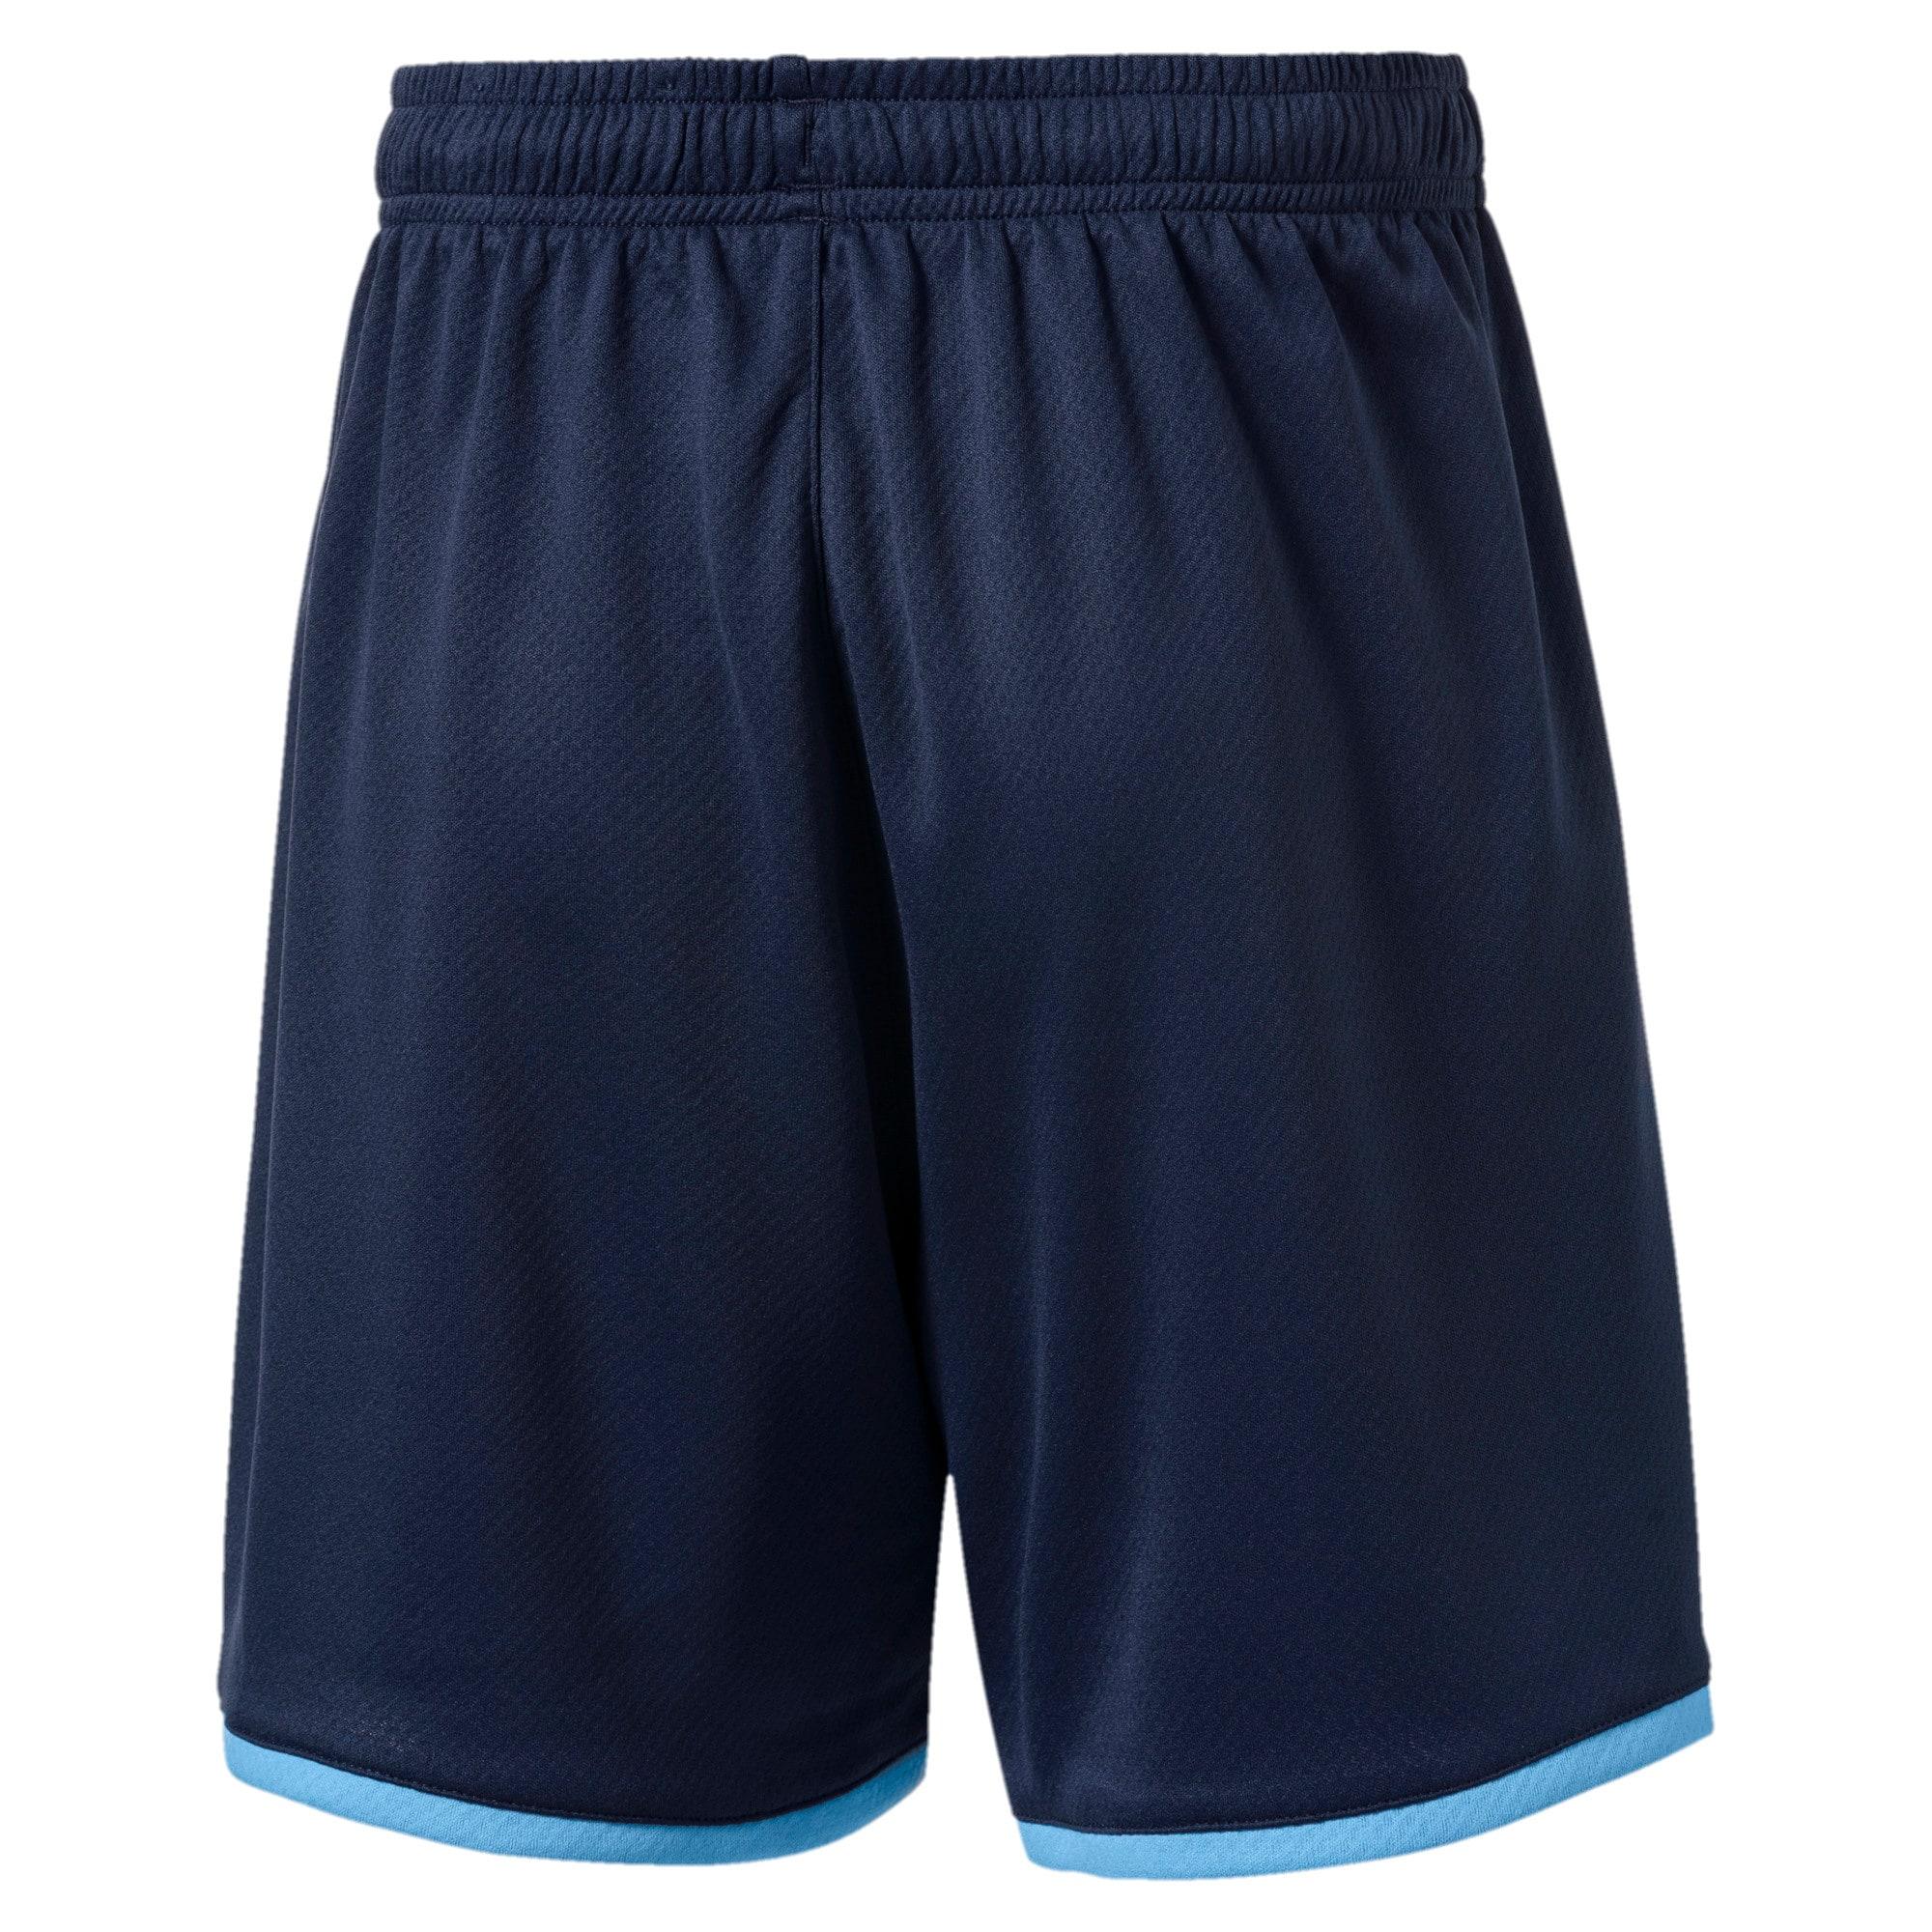 Thumbnail 2 of Borussia Mönchengladbach Boys' Replica Shorts, Peacoat, medium